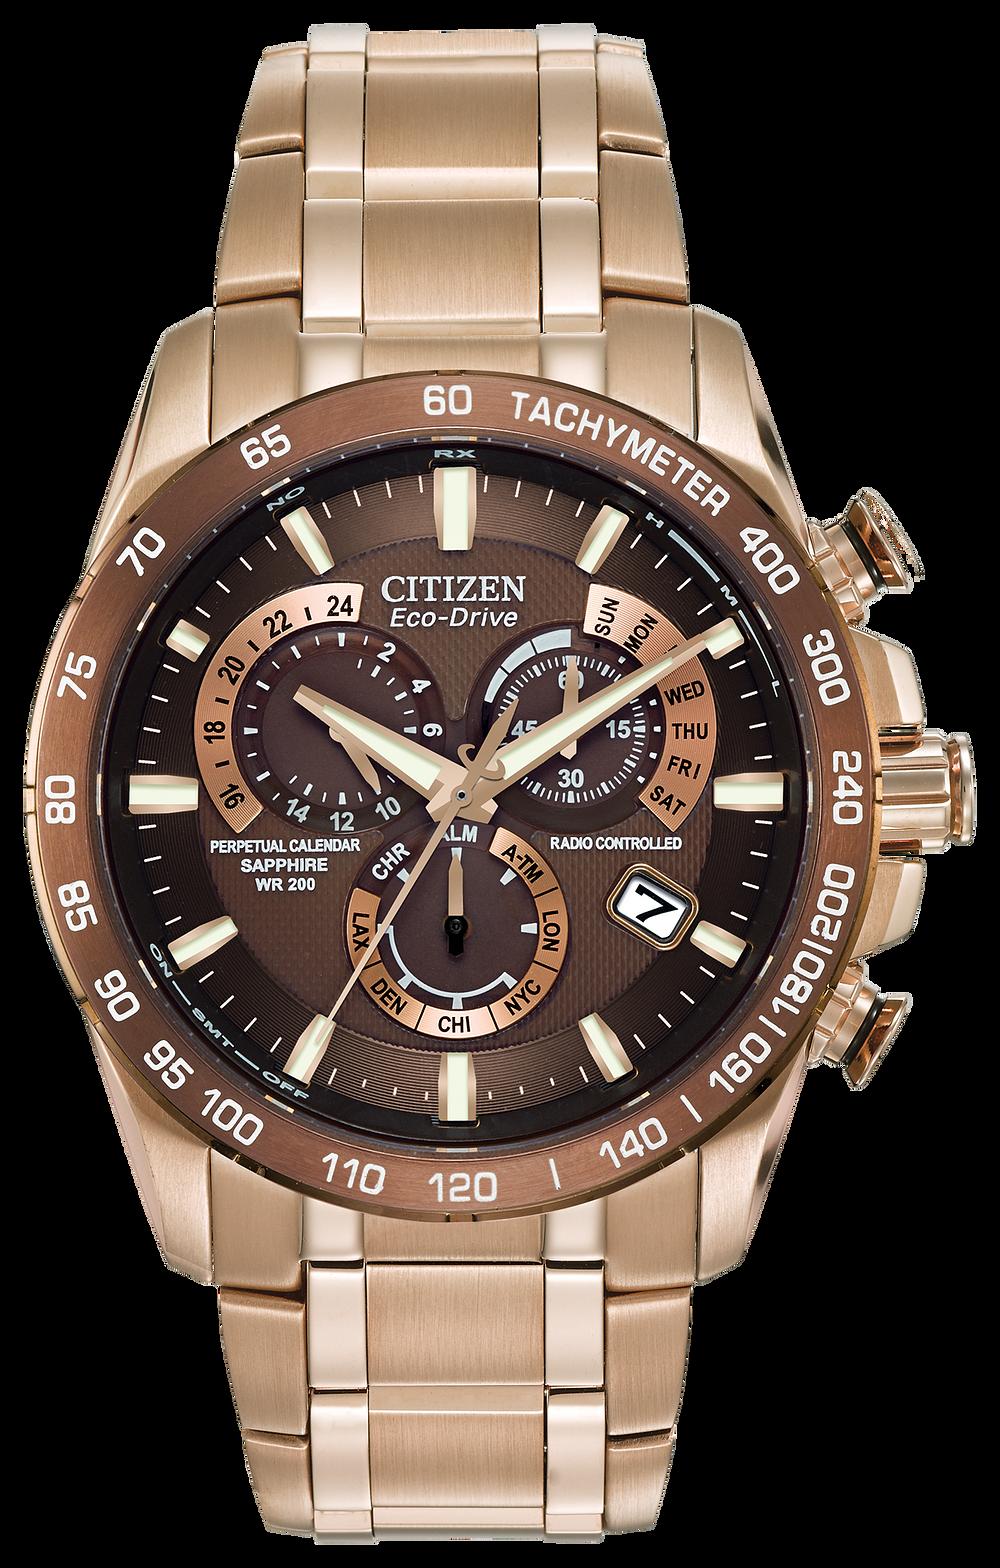 PCAT - Men's Eco-Drive AT4106-52X Gold Atomic Watch | Citizen